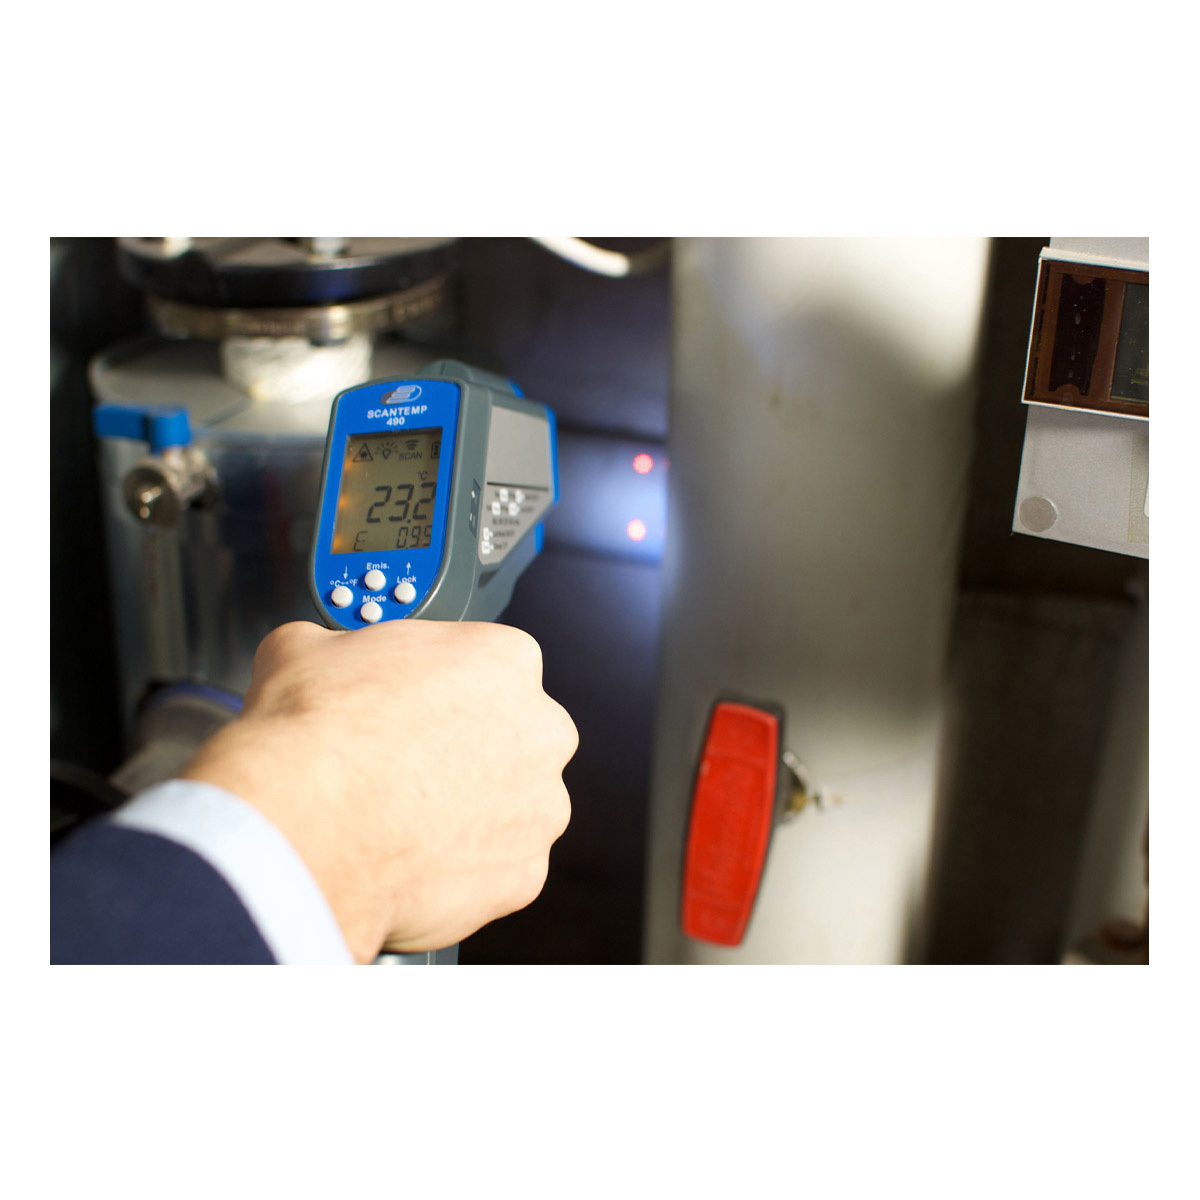 31-1123-k-infrarot-thermometer-scantemp-490-anwendung-1200x1200px.jpg